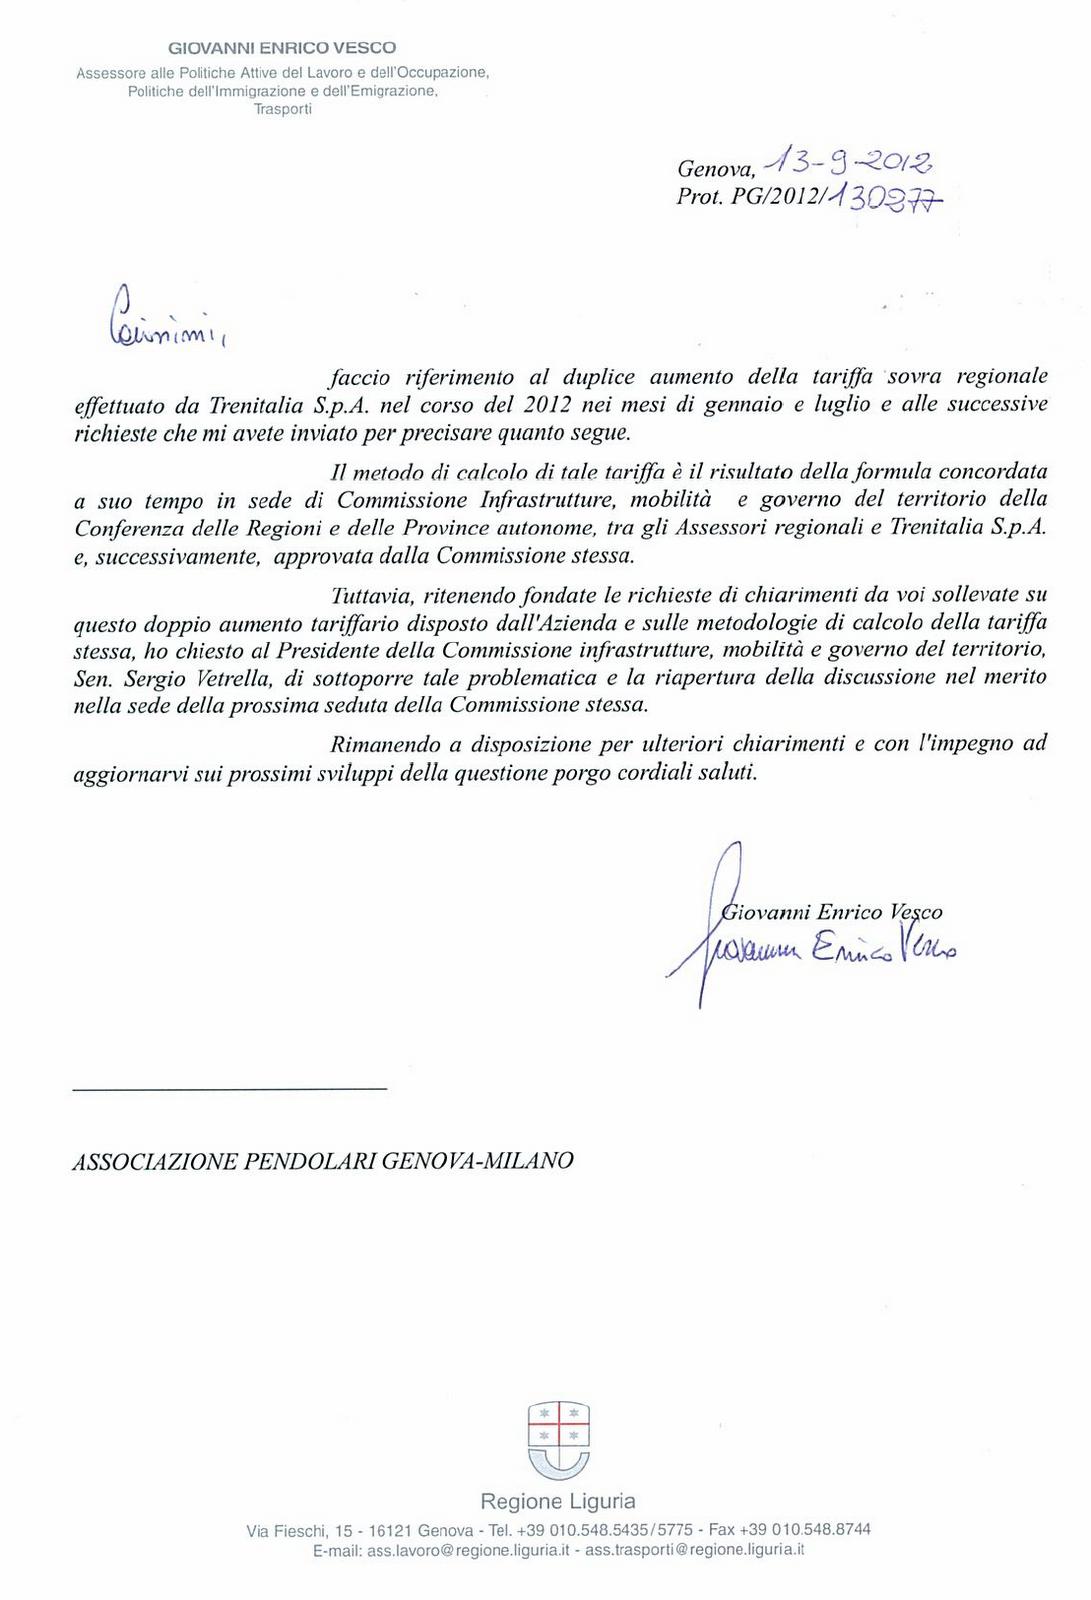 GenovaMilanoNewsletter: Tariffe sovraregionali: i nostri ...